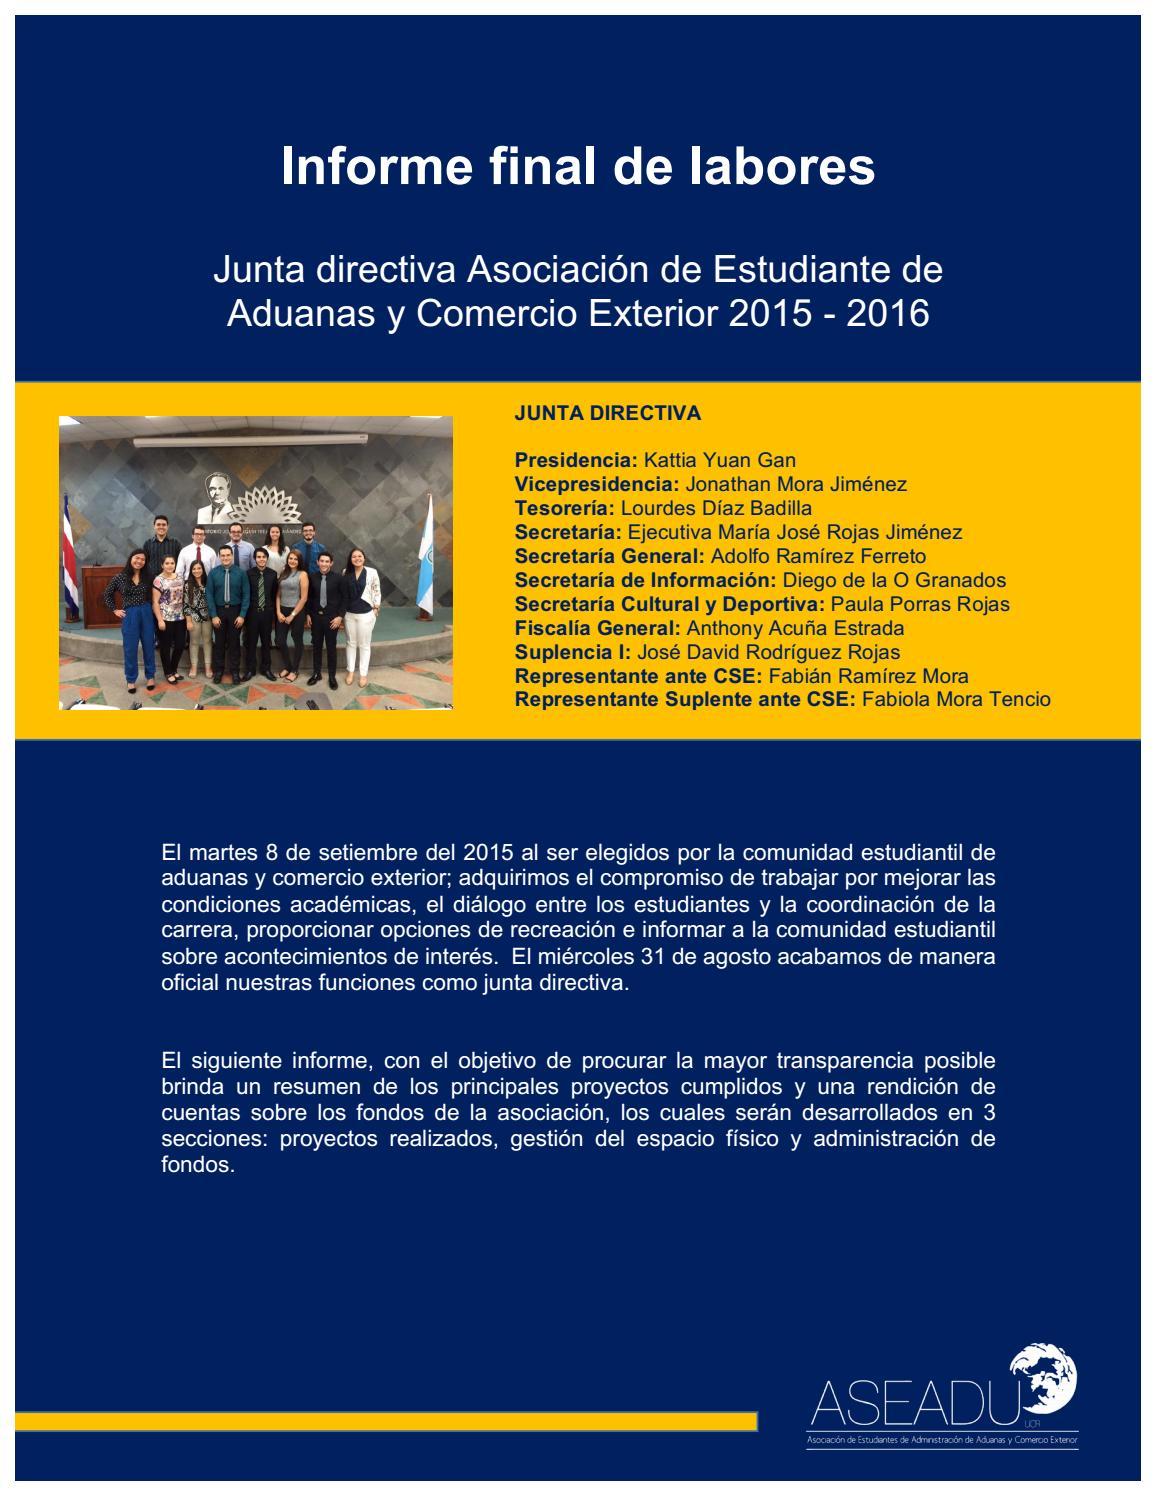 Informe Labores ASEADU 2015 - 2016 by Informe Laboral ASEADU 2015 ...